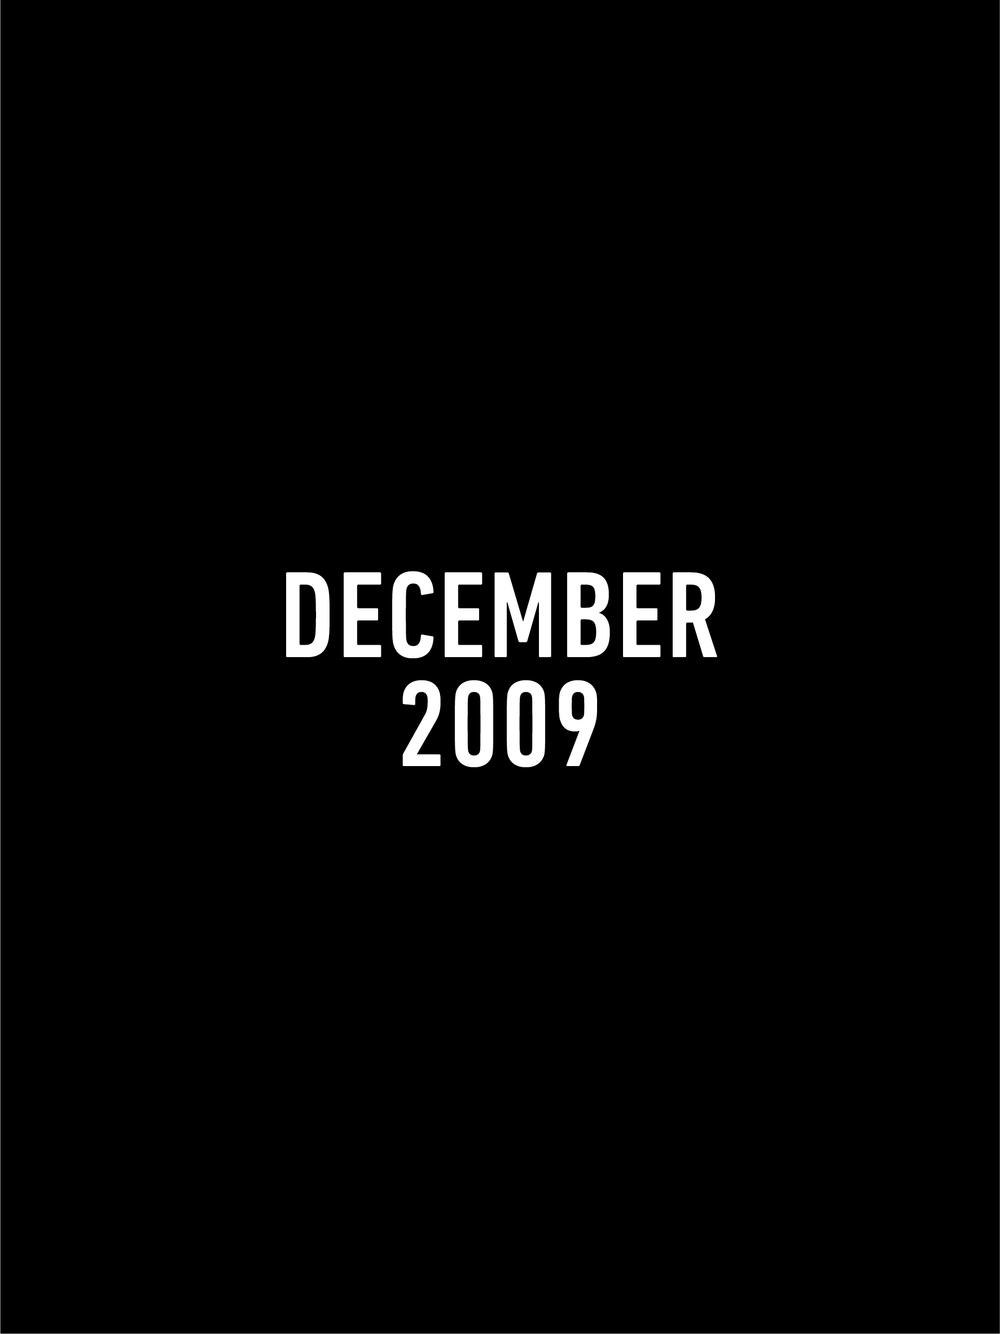 2009 monthly12.jpg